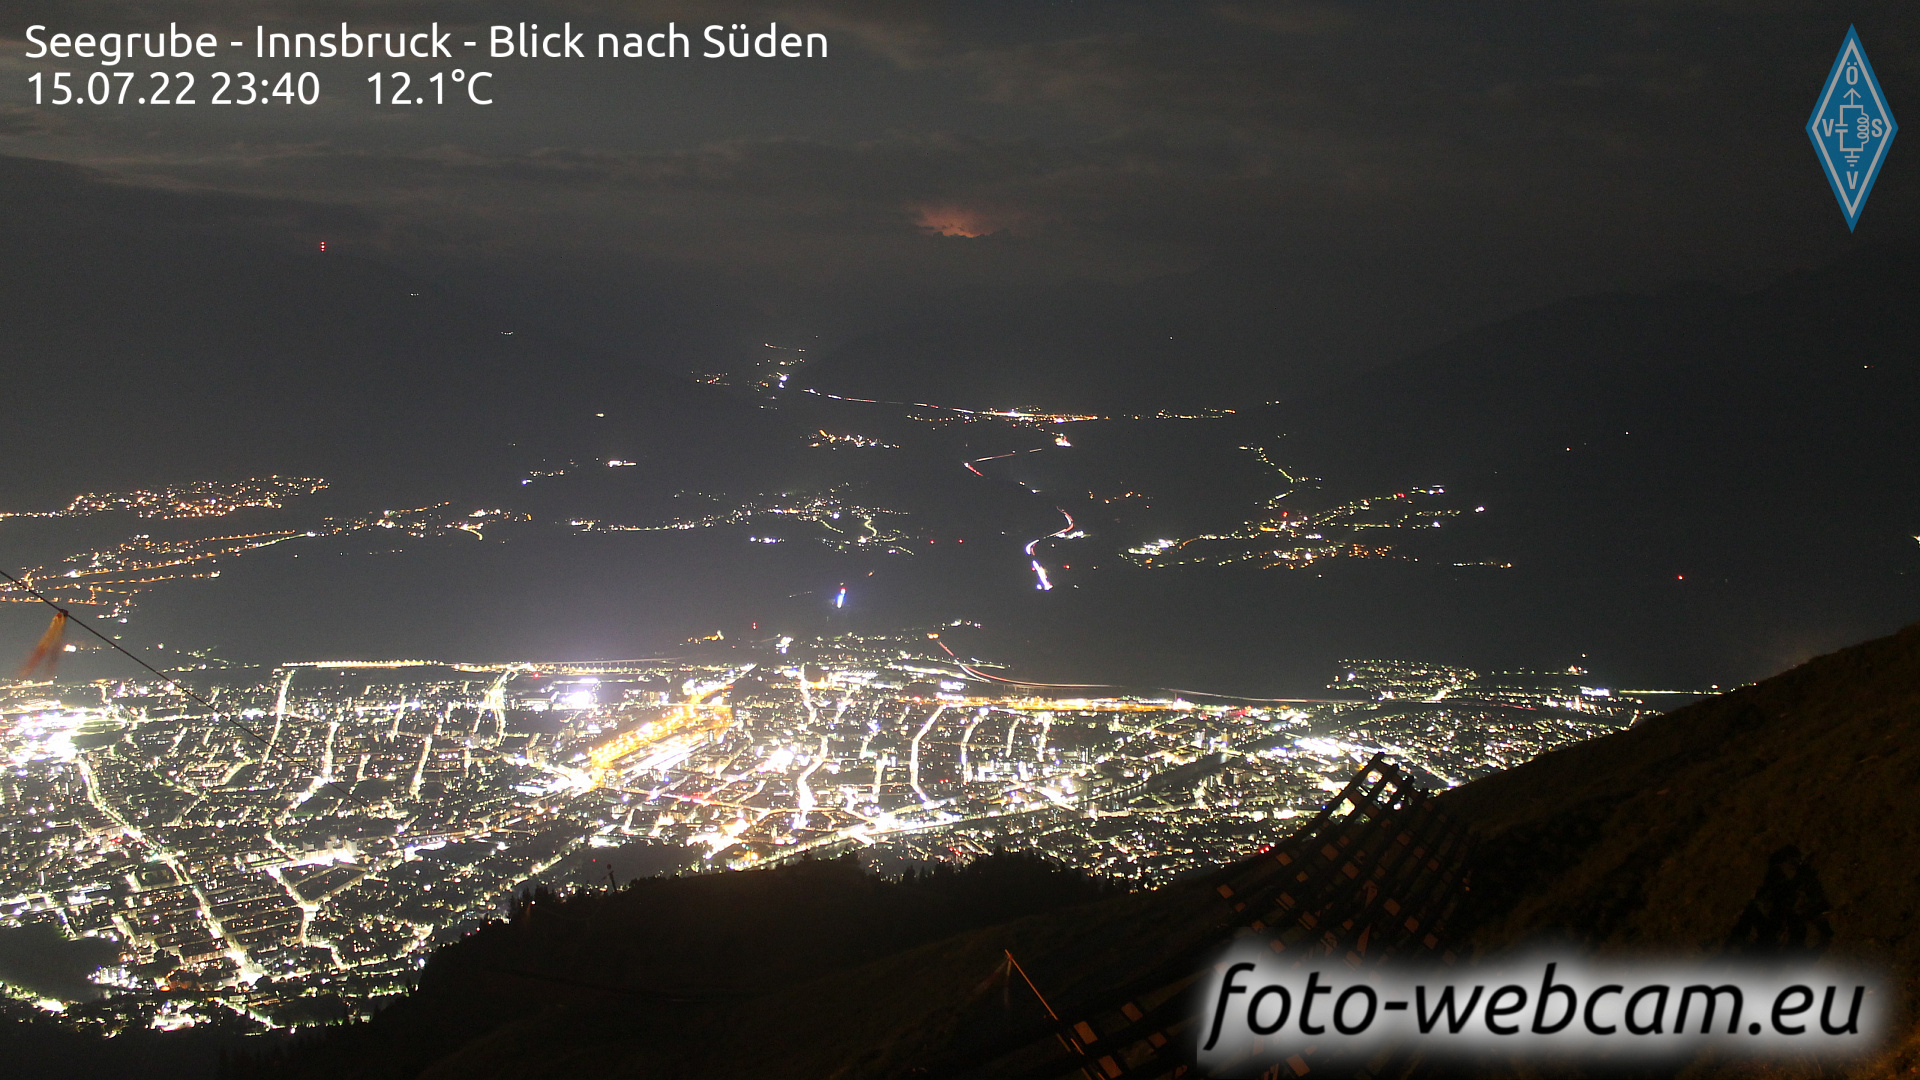 Innsbruck Wed. 23:18